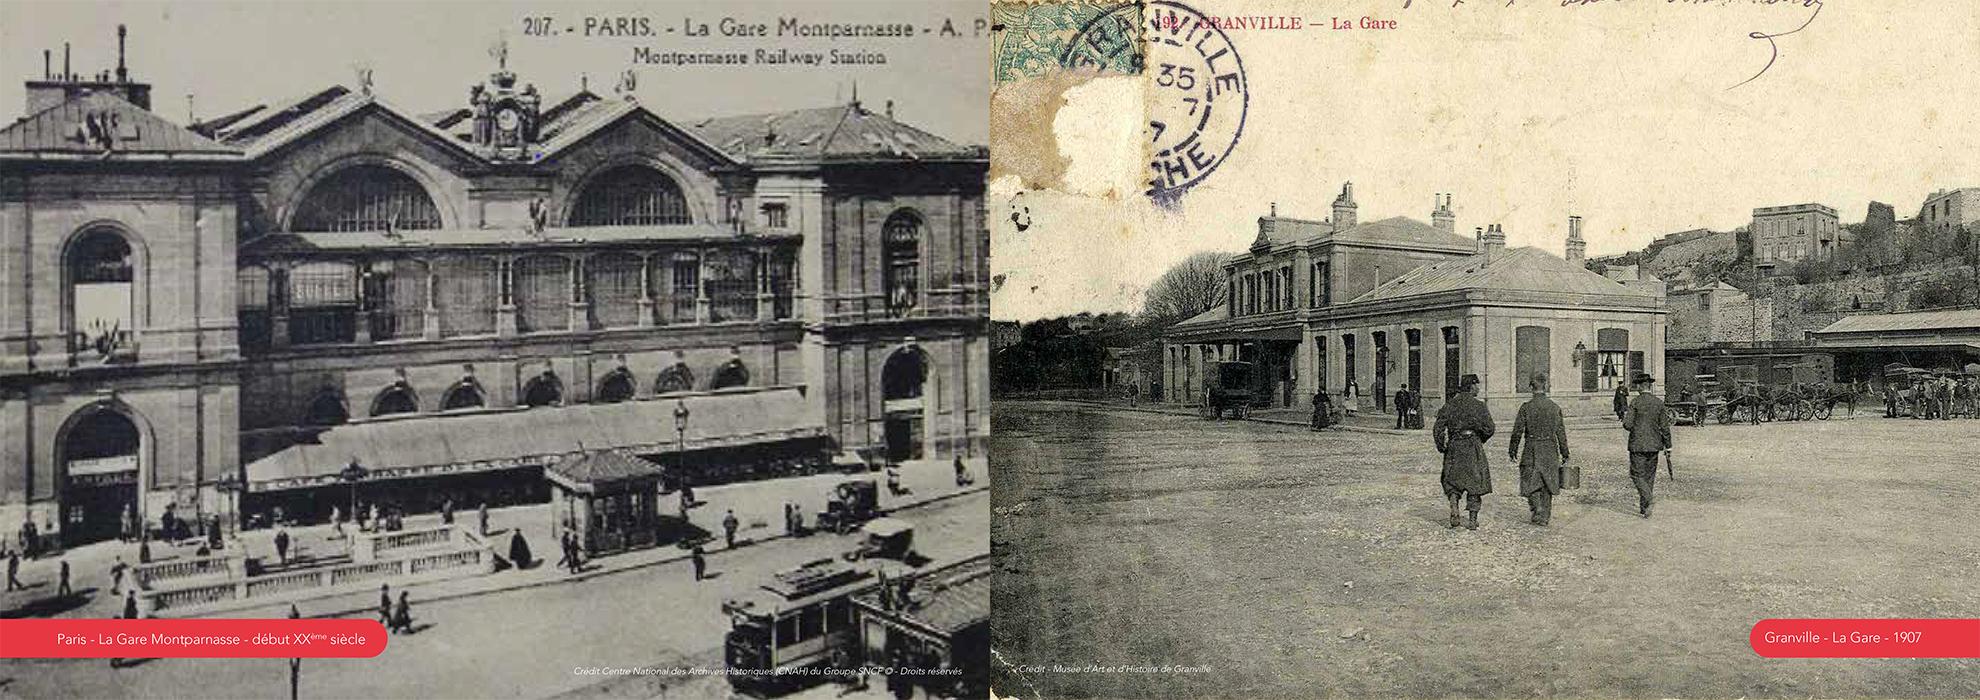 Paris-Granville